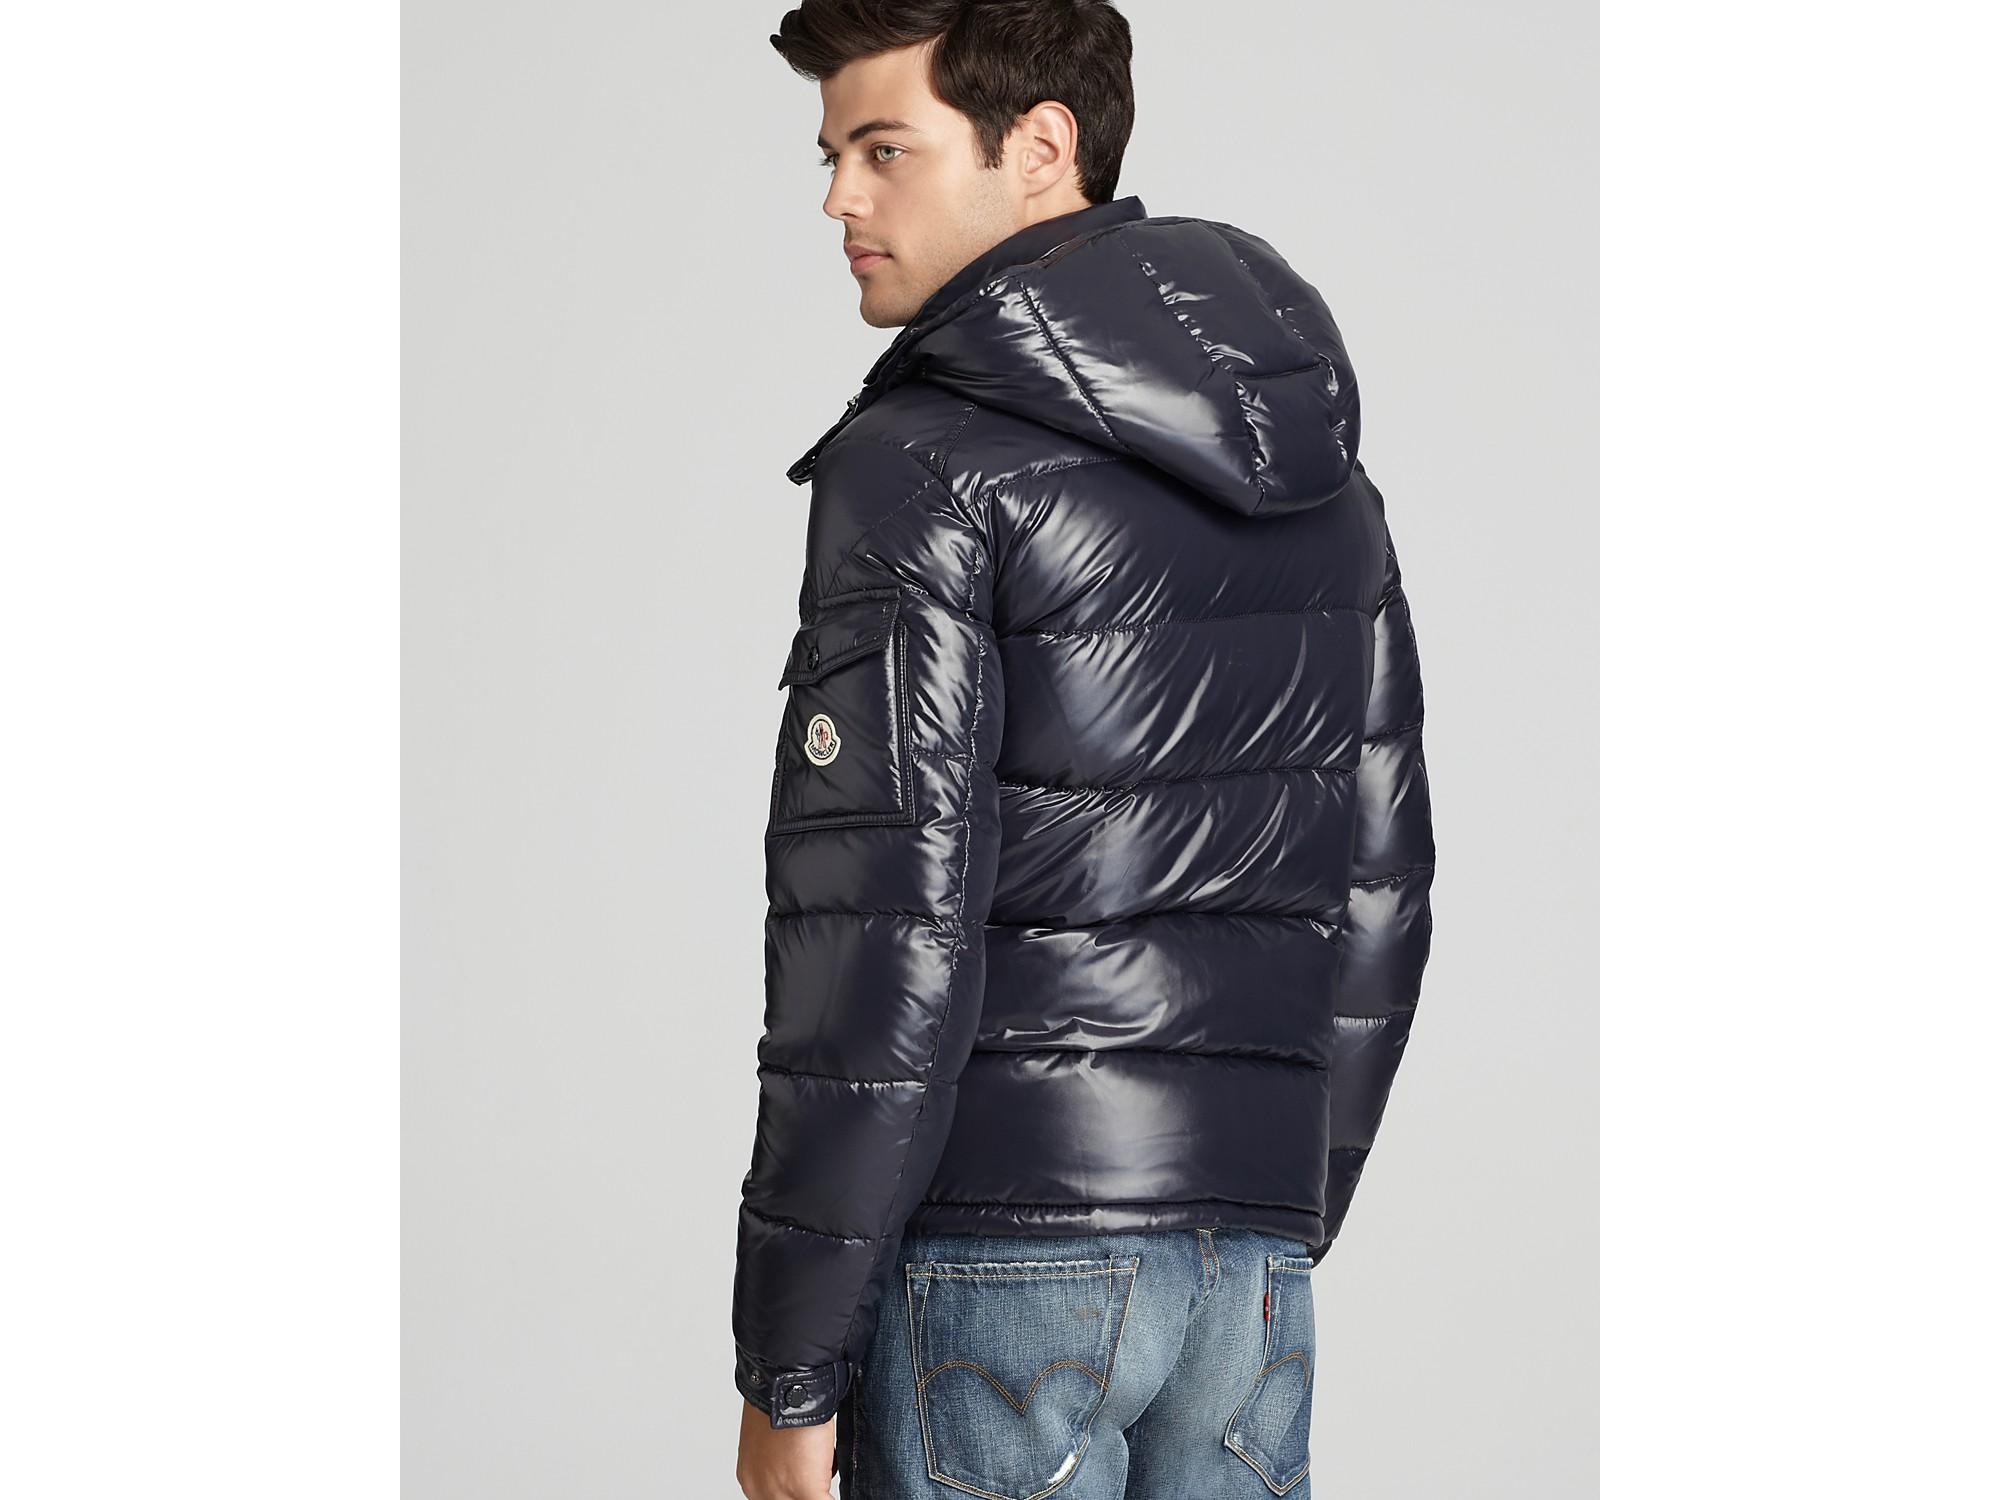 298249608d7 Men Moncler Lyst Maya for Blue Jacket in zx86w0q